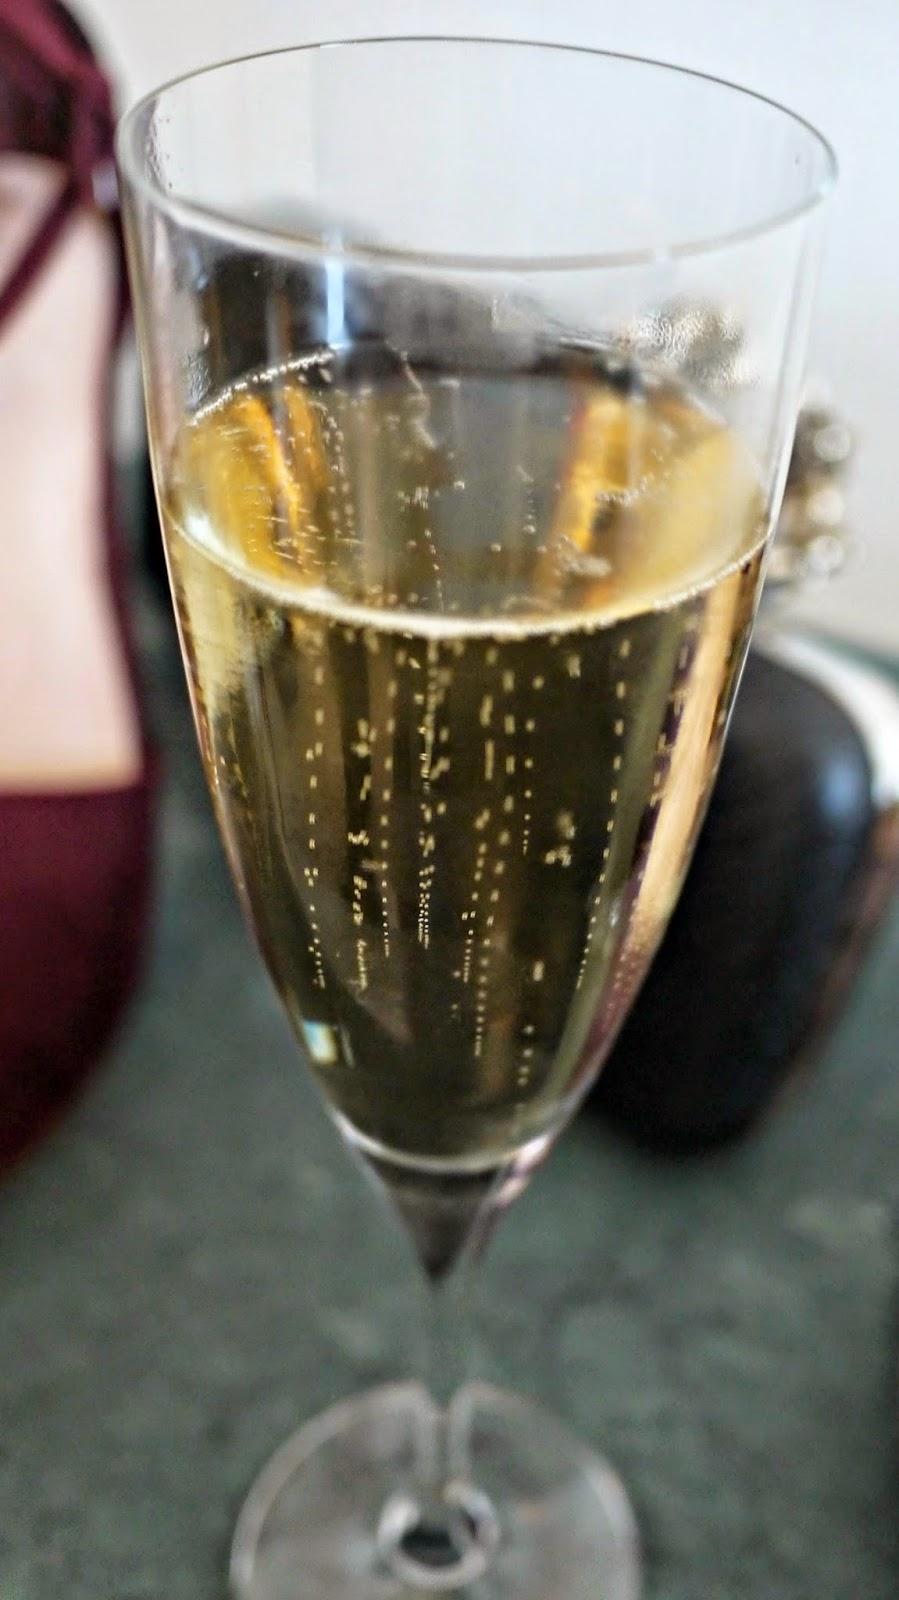 Next press day champagne